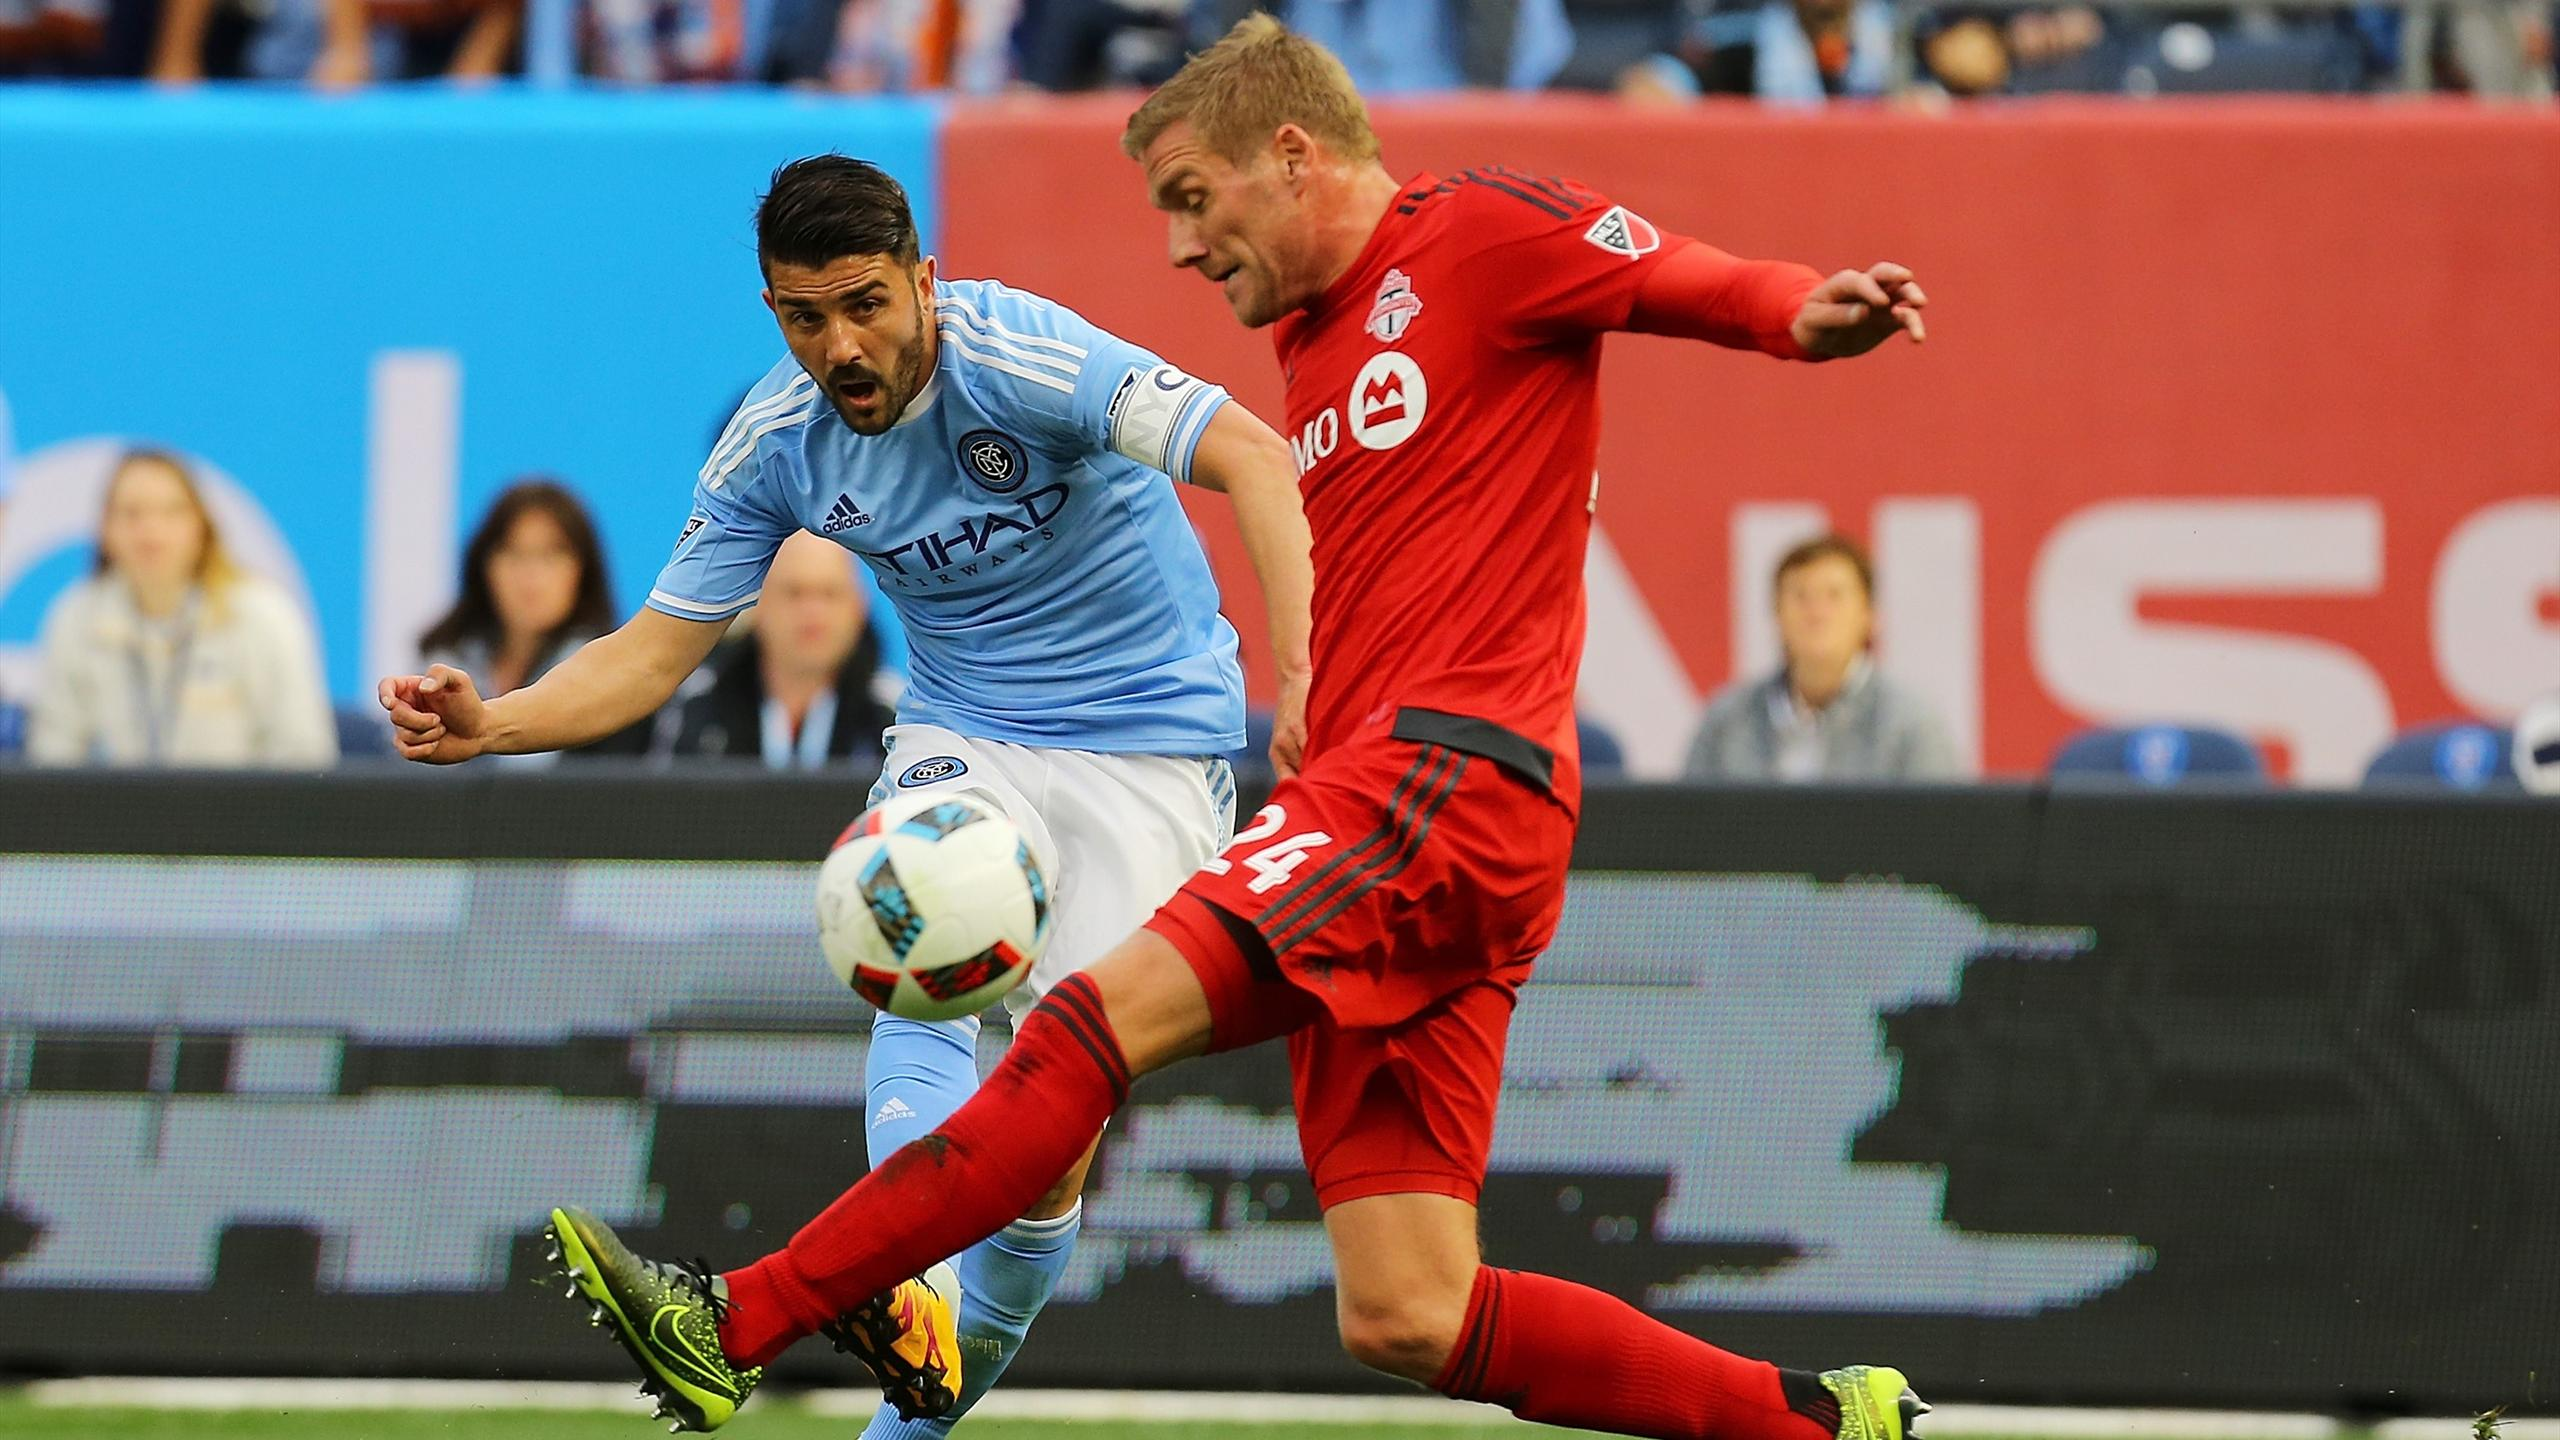 David Villa (New York FC) face à Damien Perquis (Toronto)